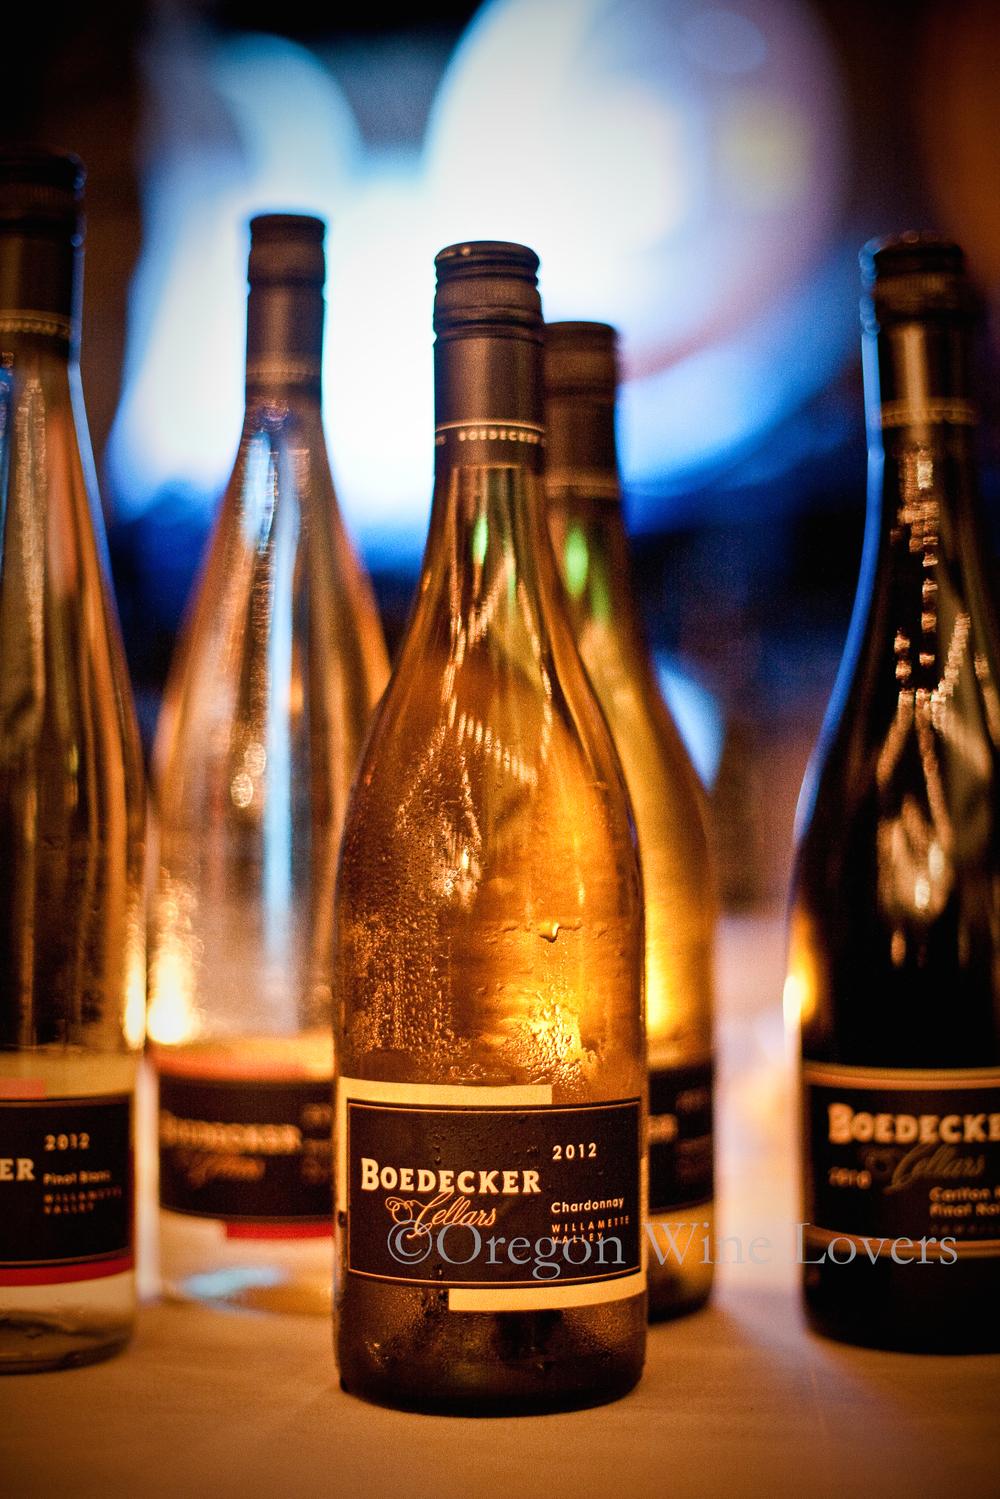 Oregon Wine Lovers11.jpg